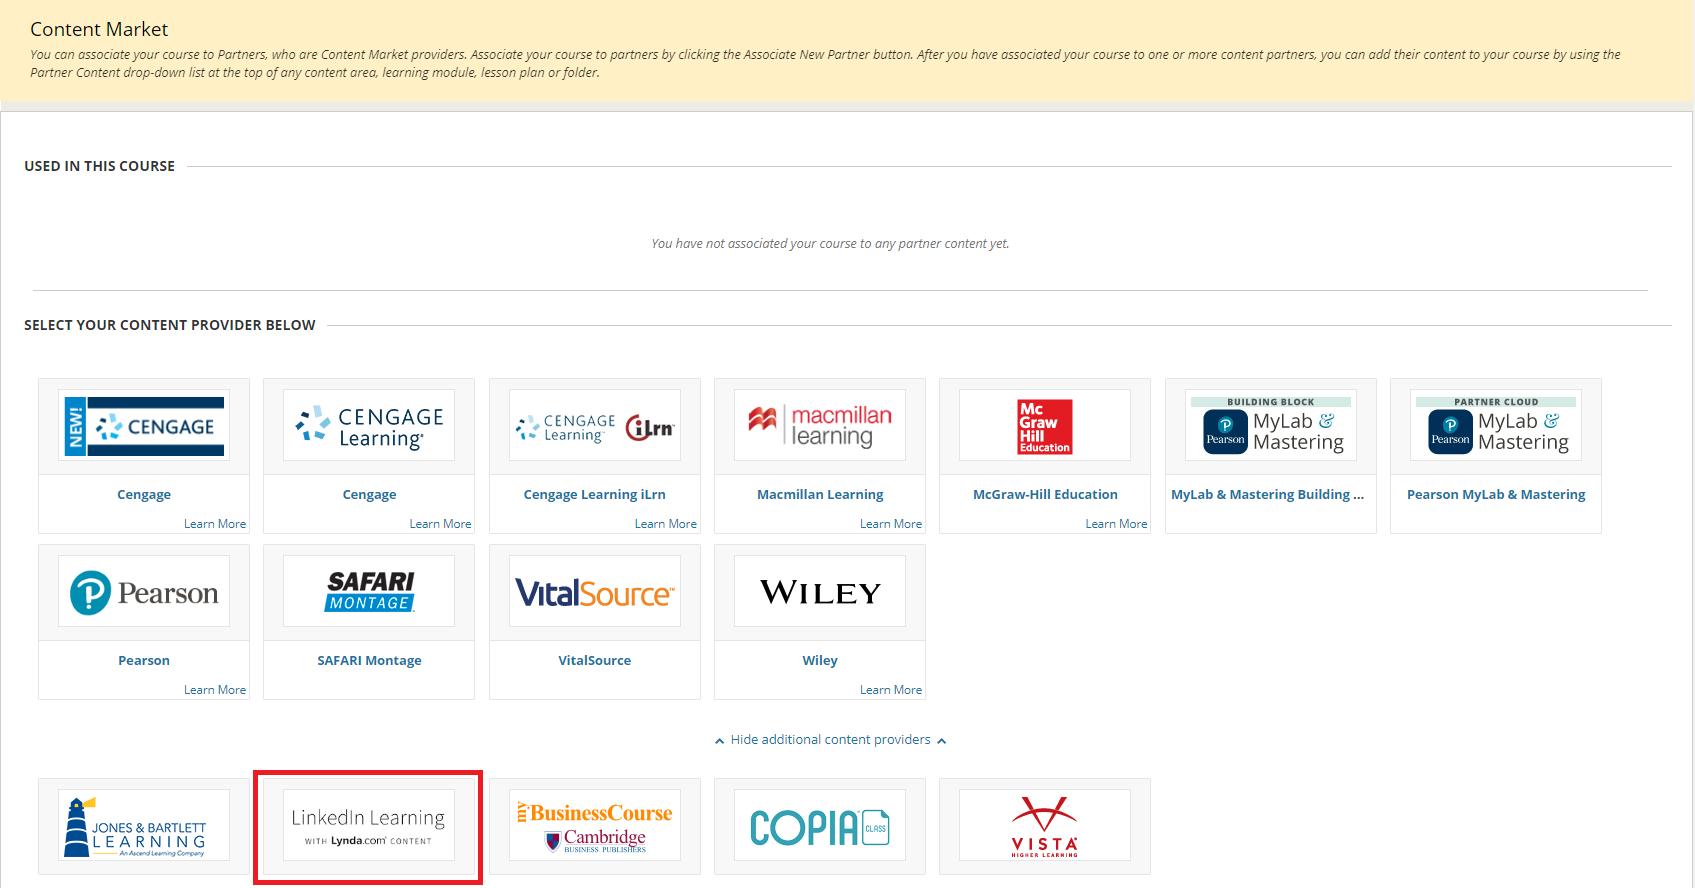 Select LinkedIn Learning